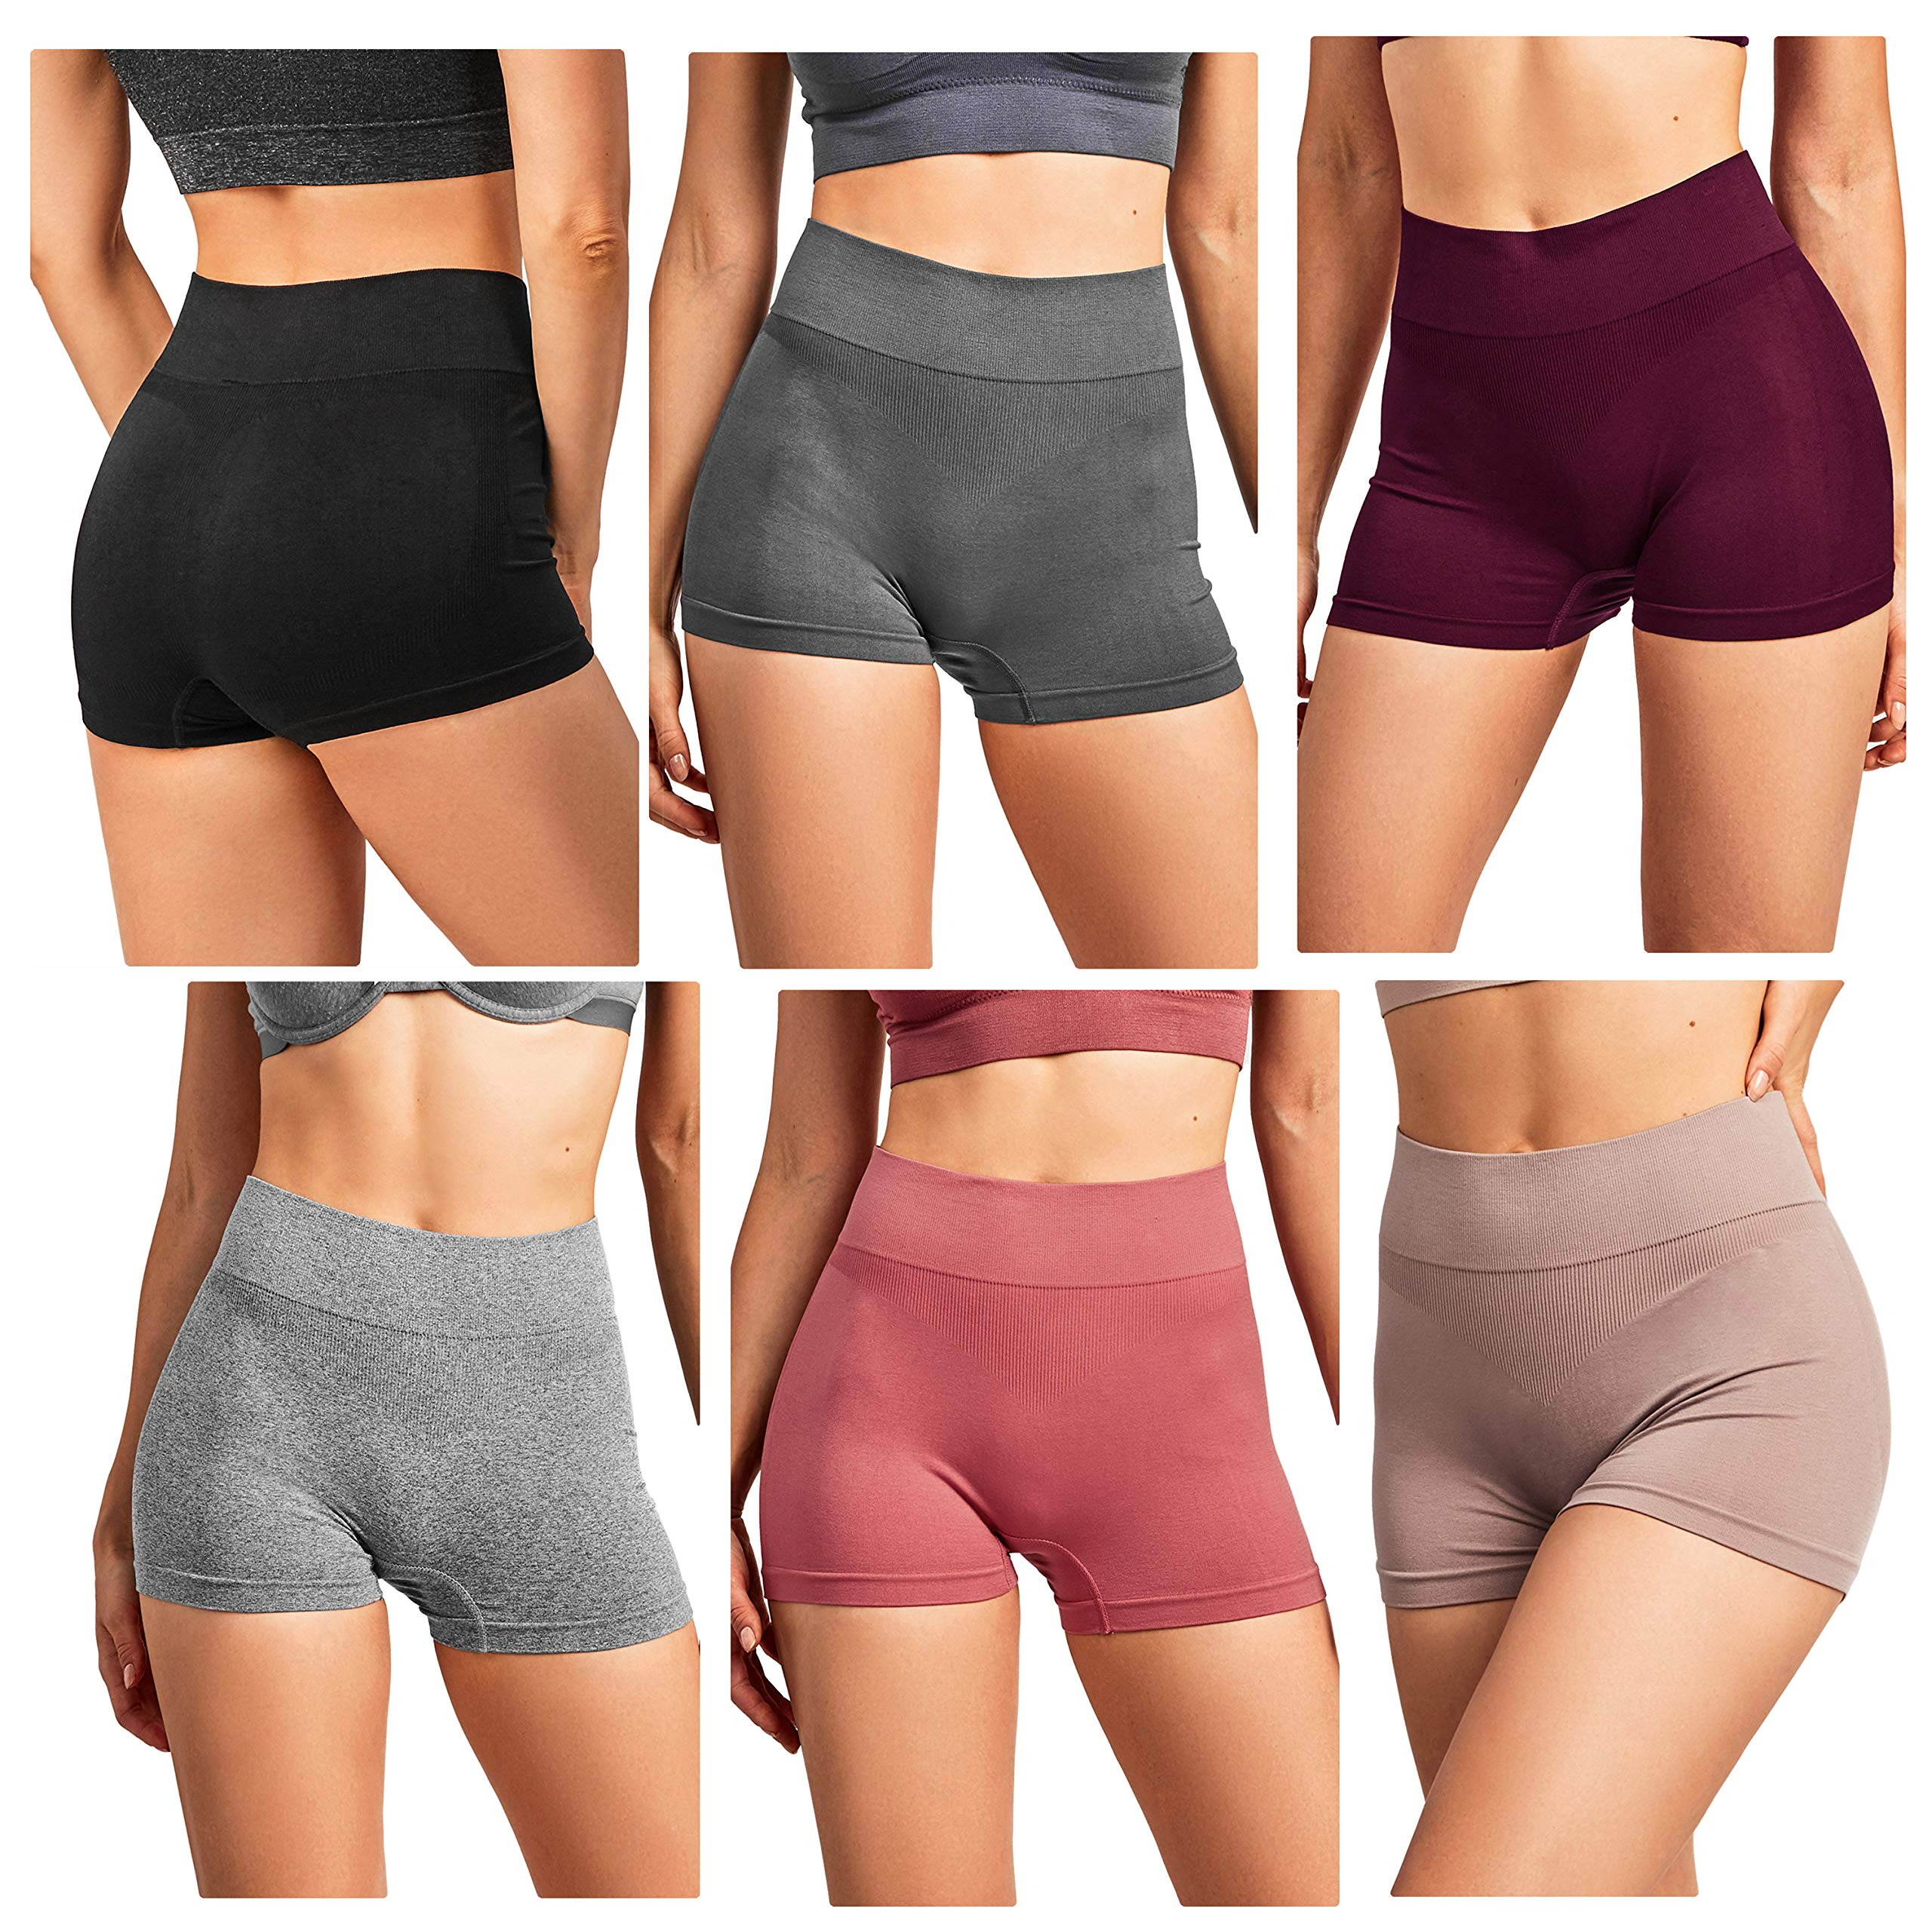 Gilbins Women Seamless Stretch Boy Shorts Panties Various Styles (High Waisted 1)